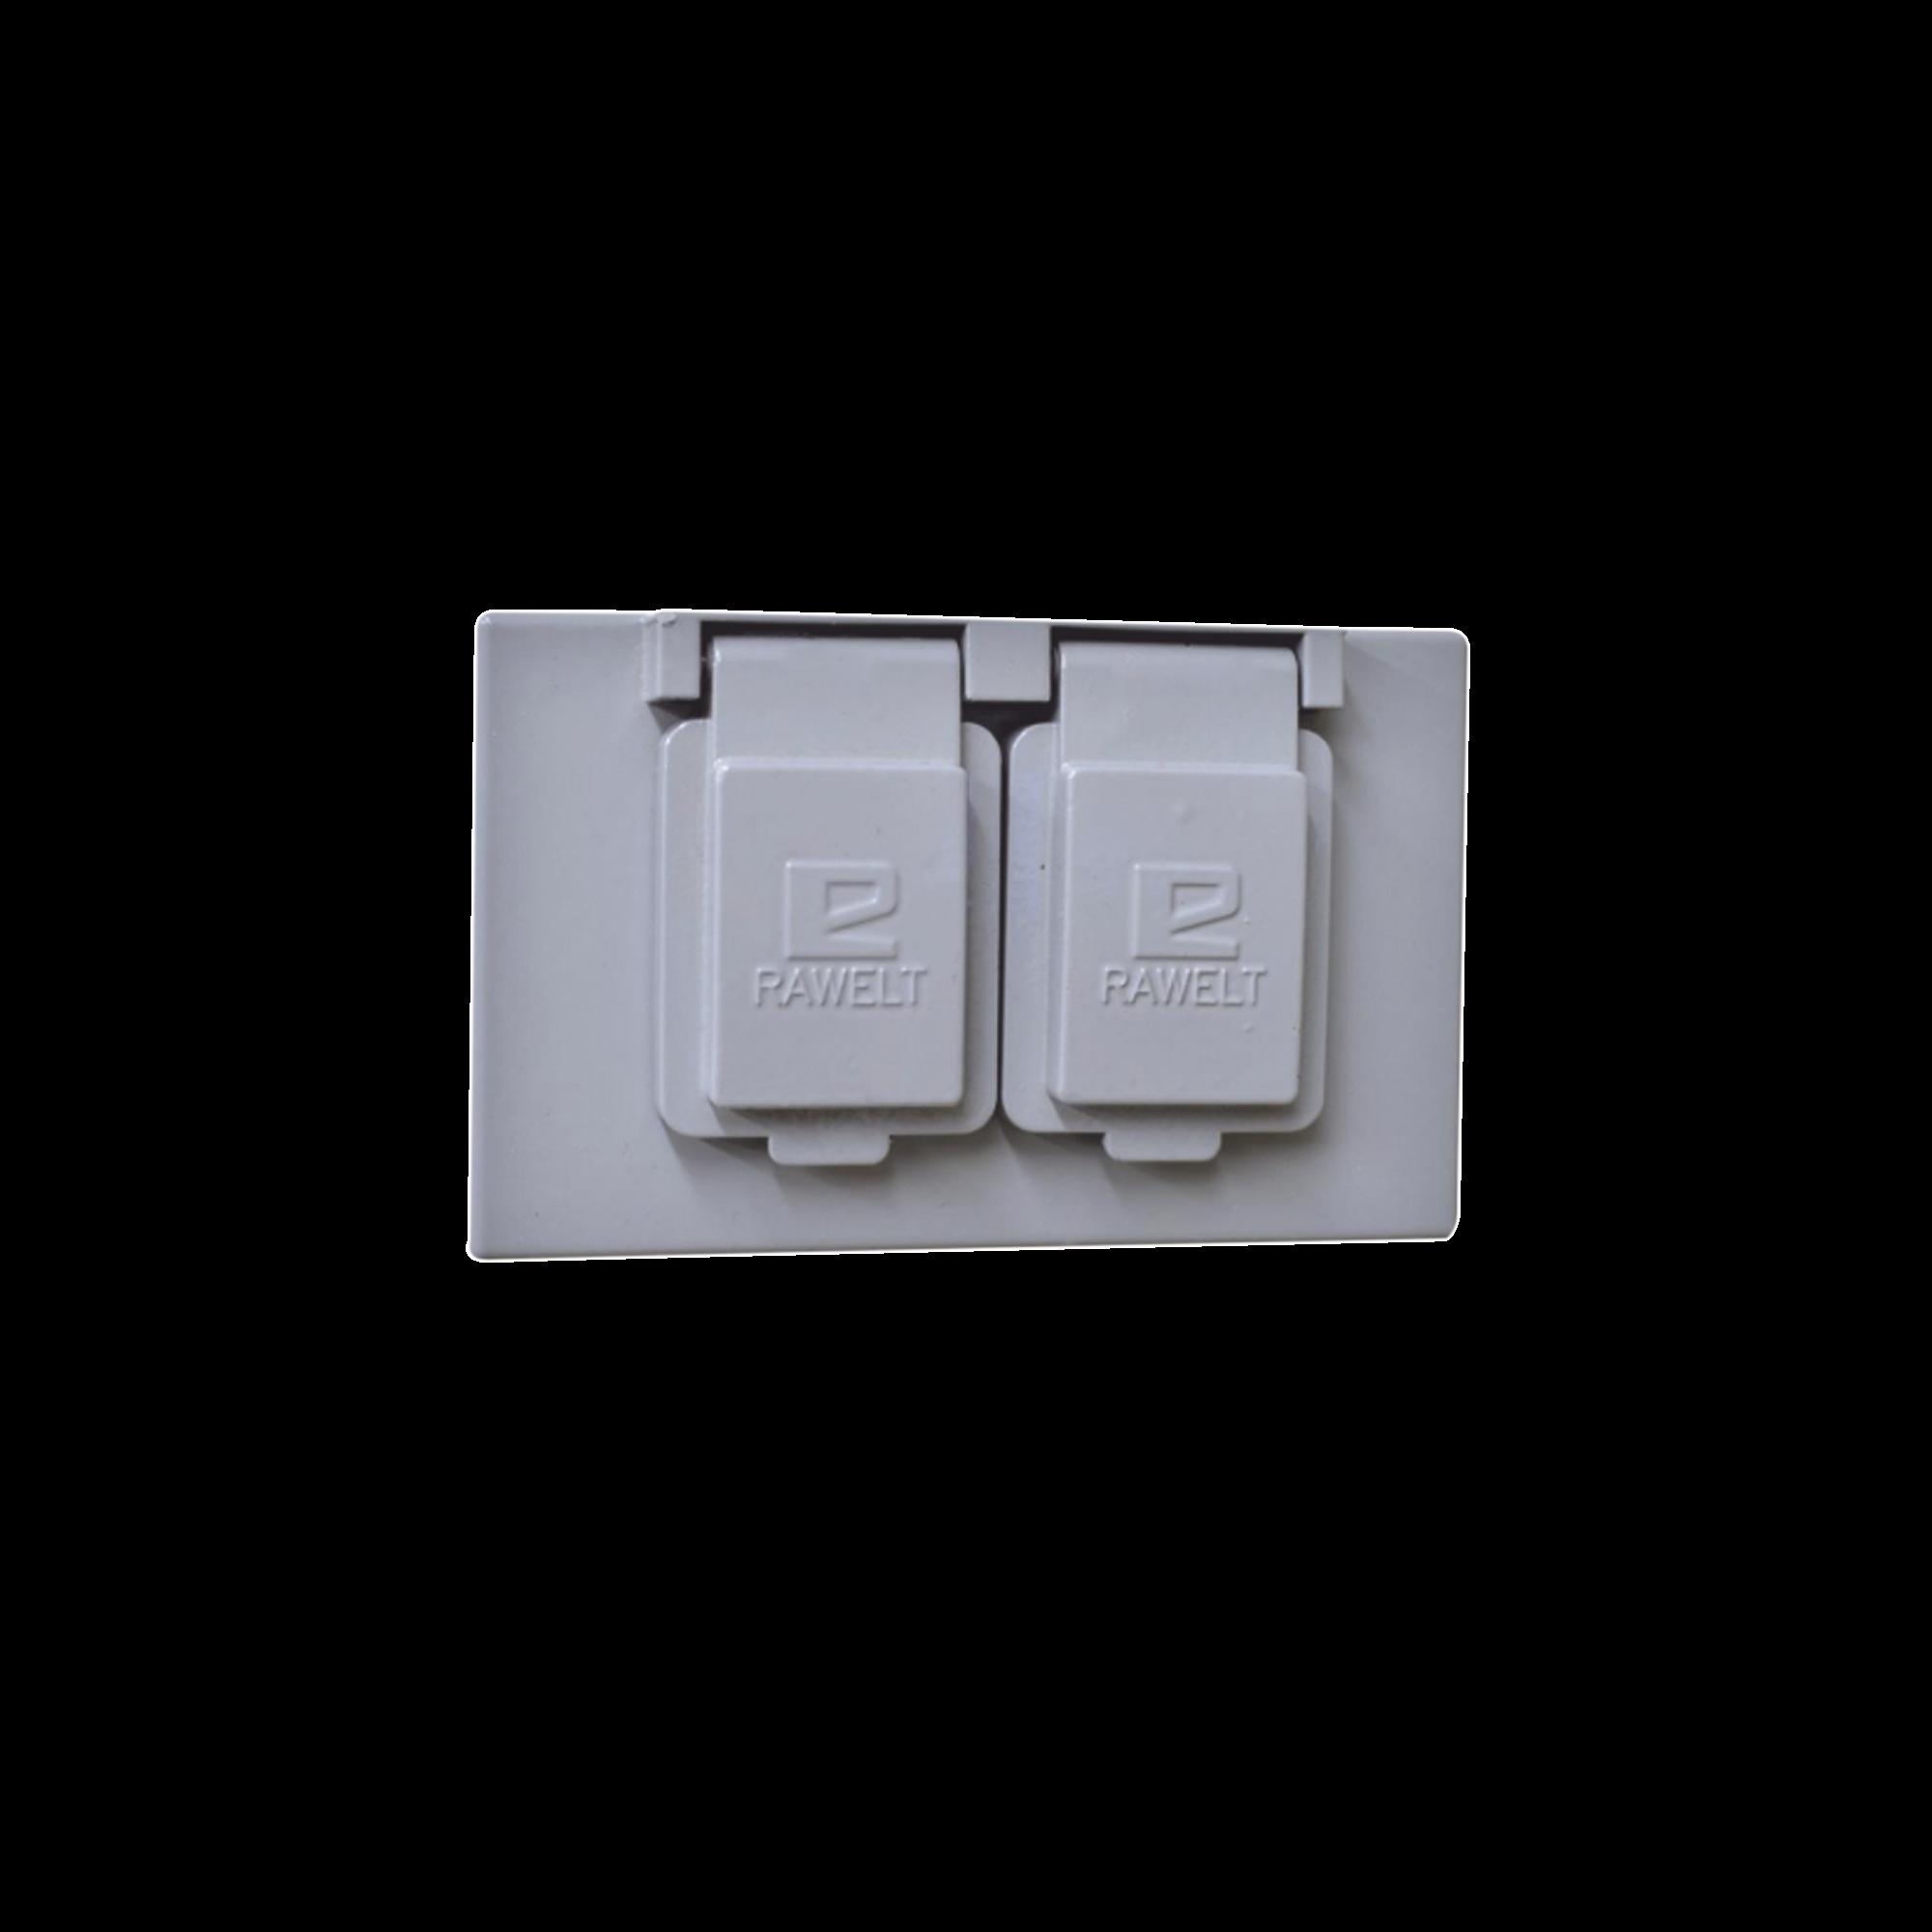 Tapa rectangular duplex horizontal con  contratapa con mecanismo de auto-cierre de aluminio para uso de interiores y exteriores tipo RR.